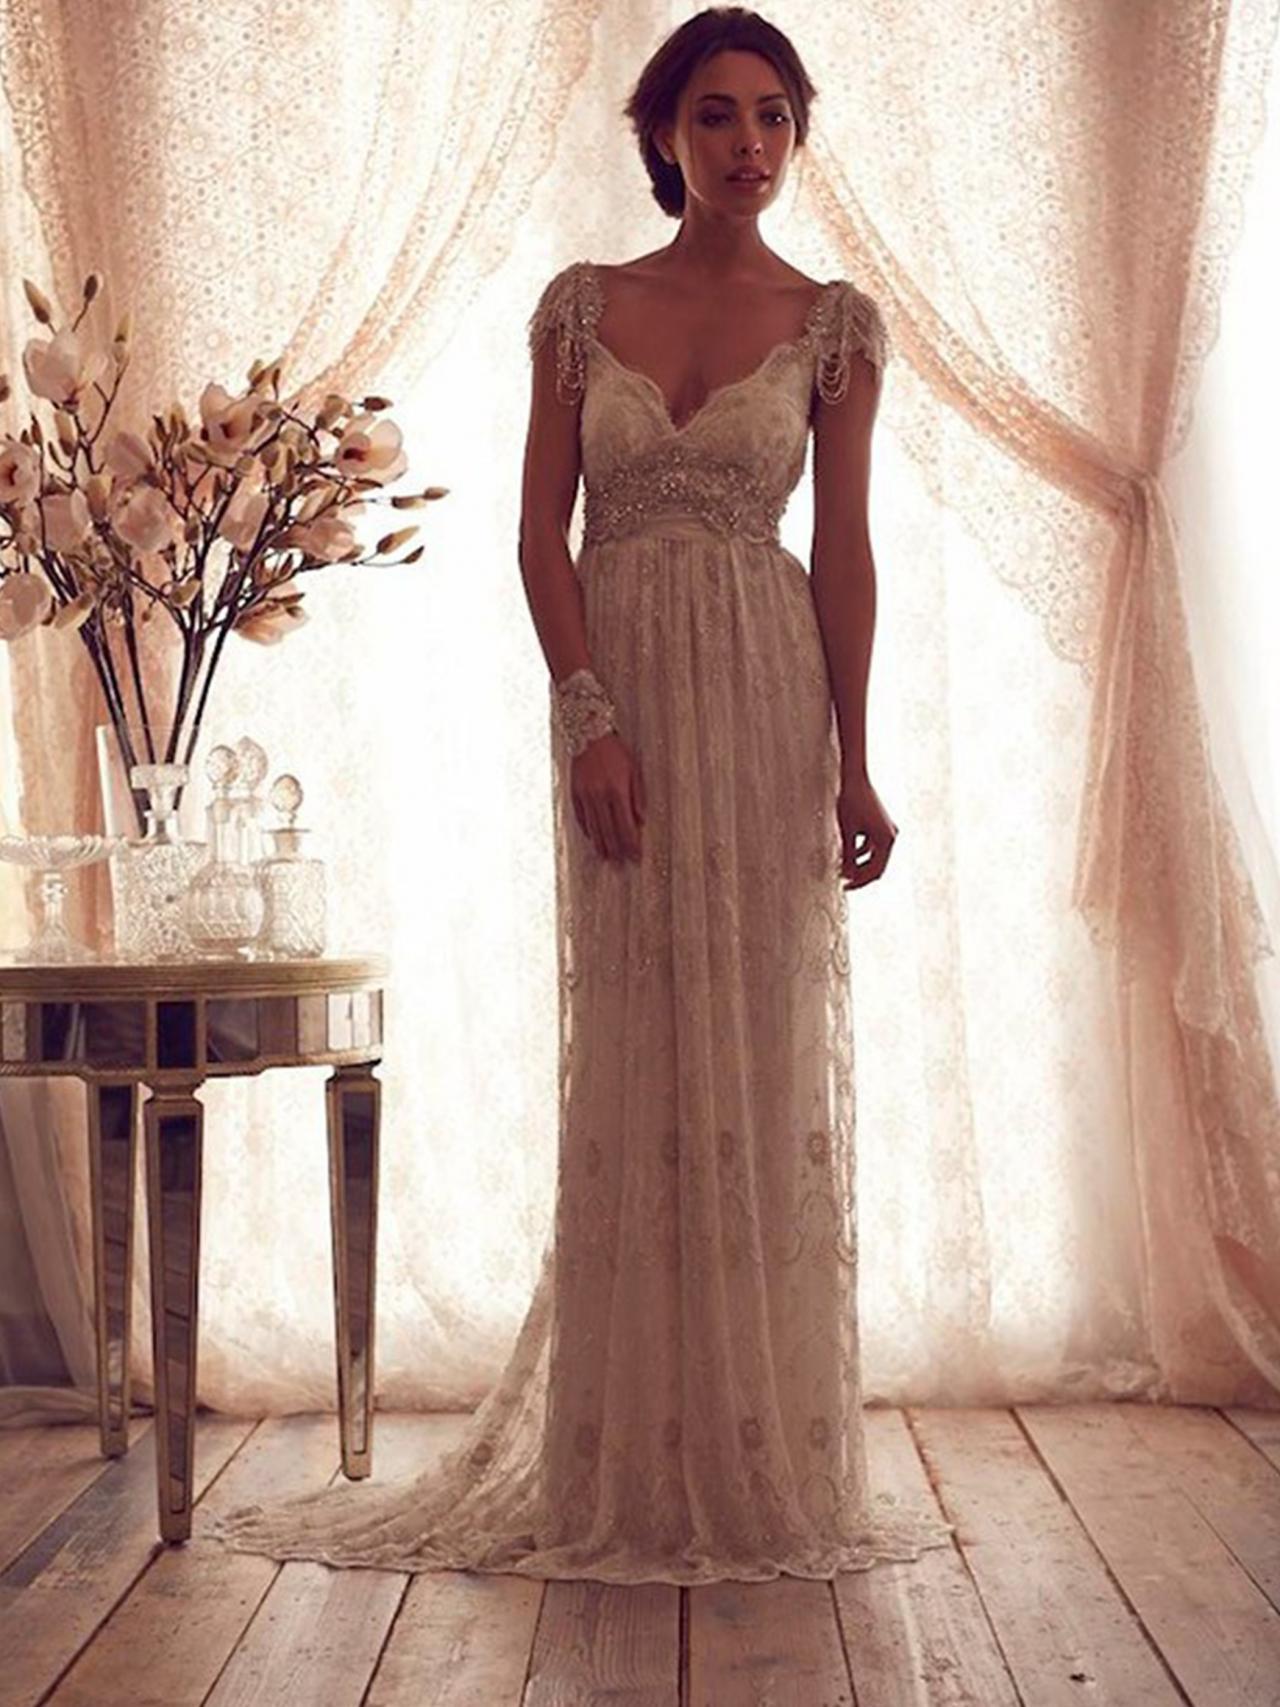 wedding dresses second hand perth 2nd hand wedding dresses Second Hand Wedding Dress Perth